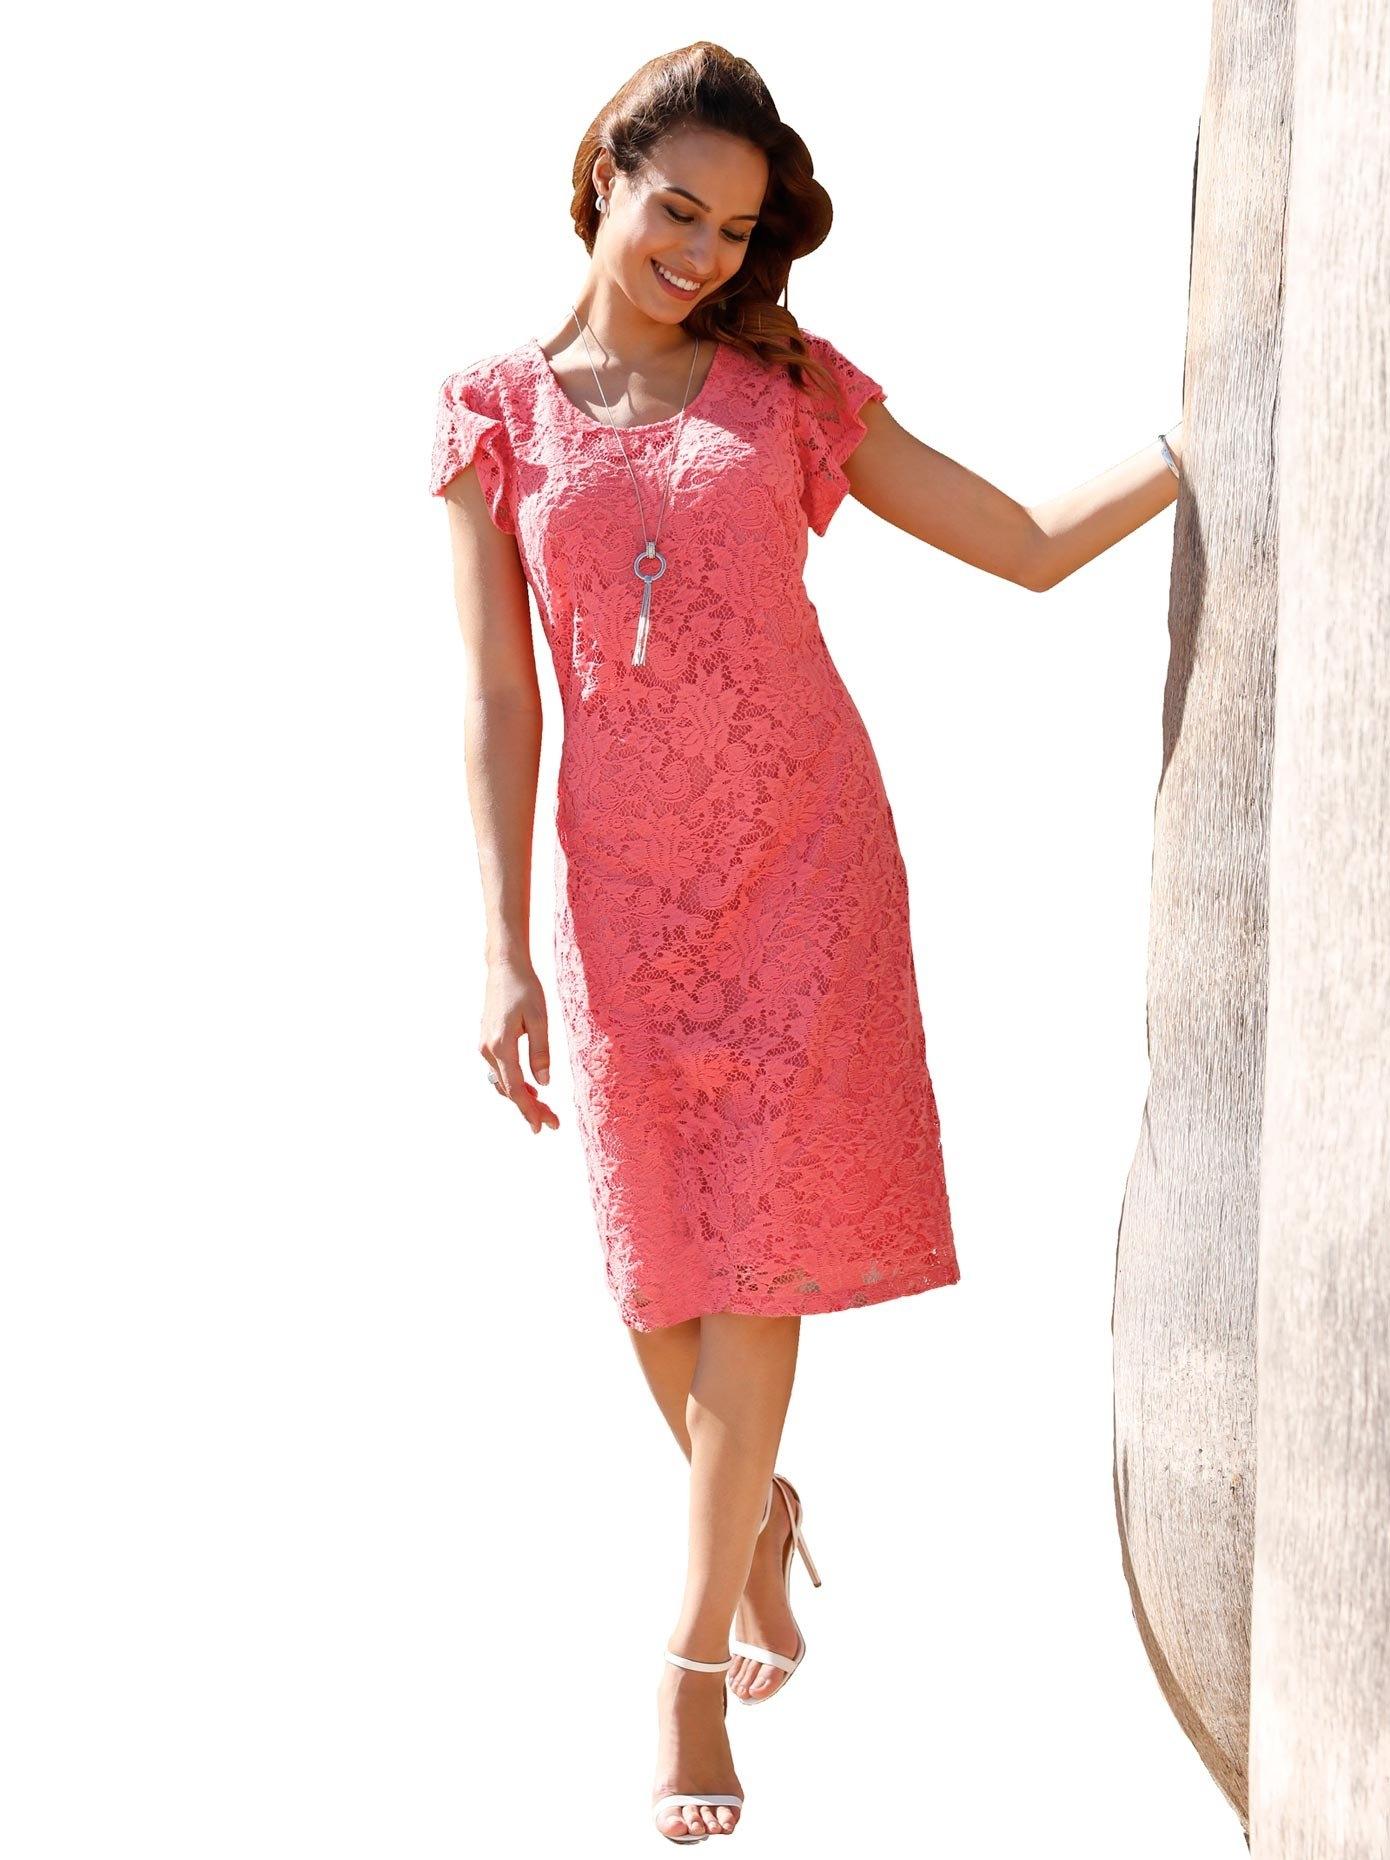 Lady jurk met chique, prettig zachte kant all-over nu online bestellen